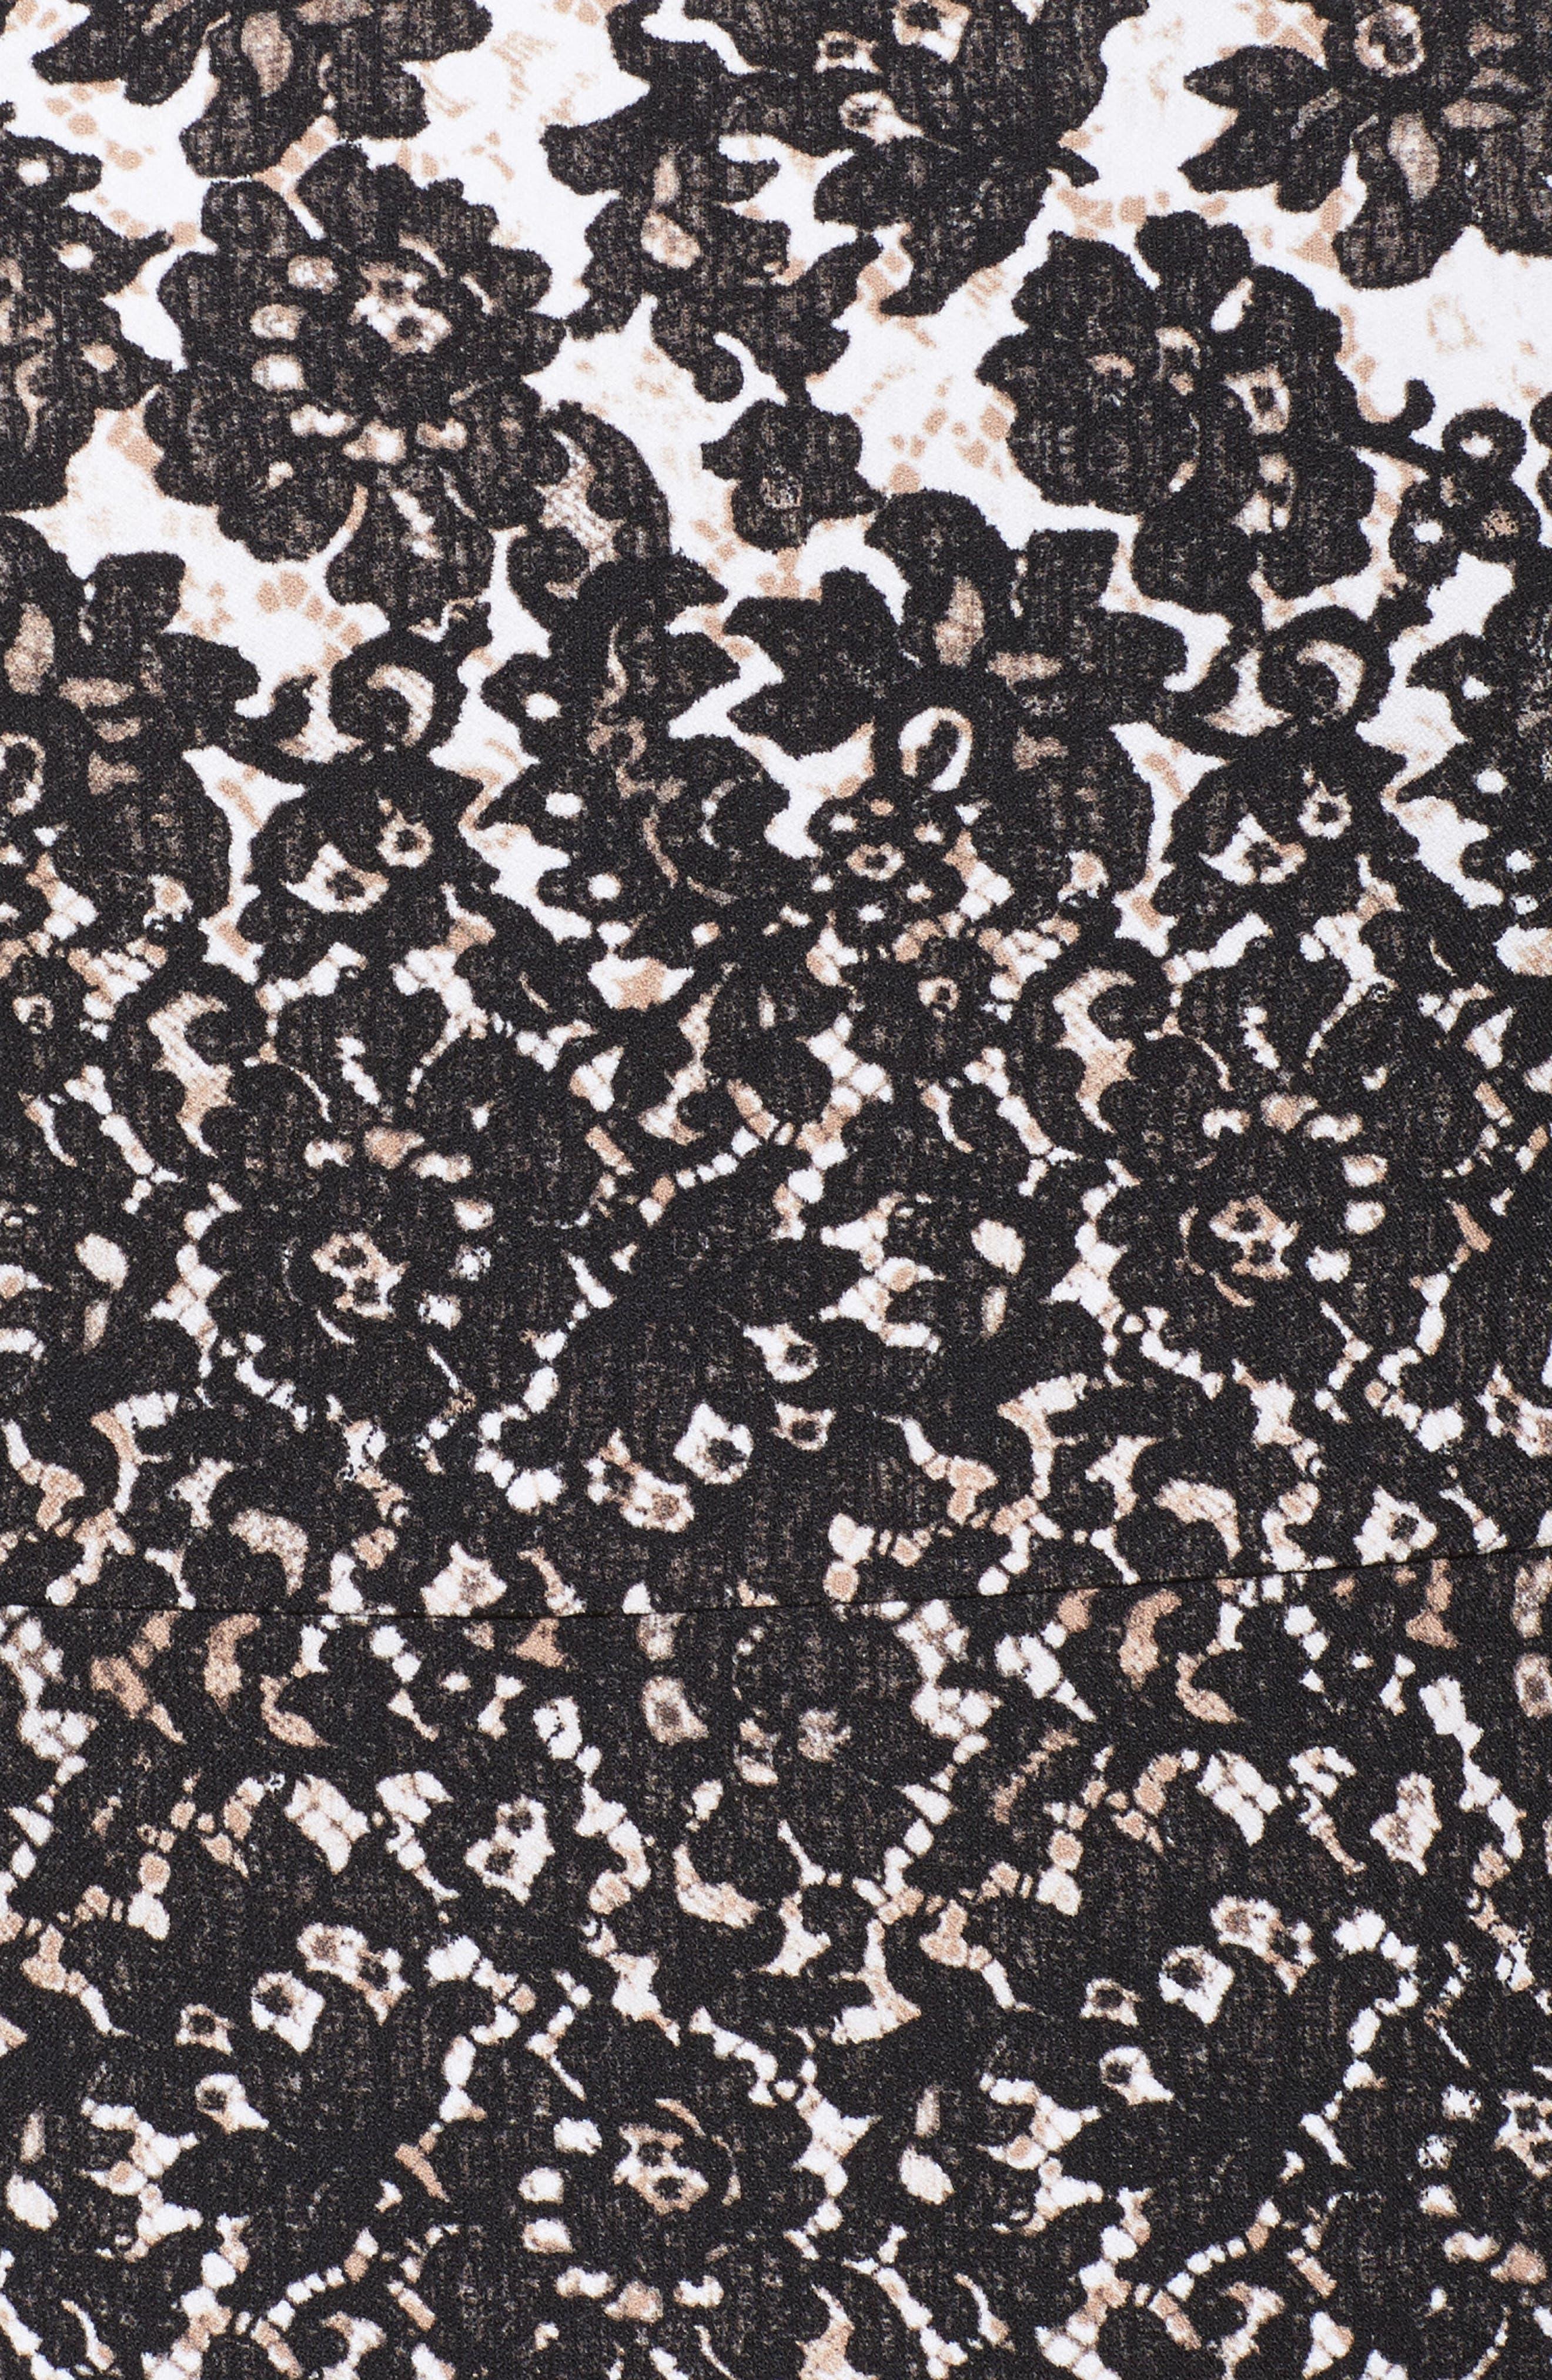 Lace Print Fit & Flare Dress,                             Alternate thumbnail 5, color,